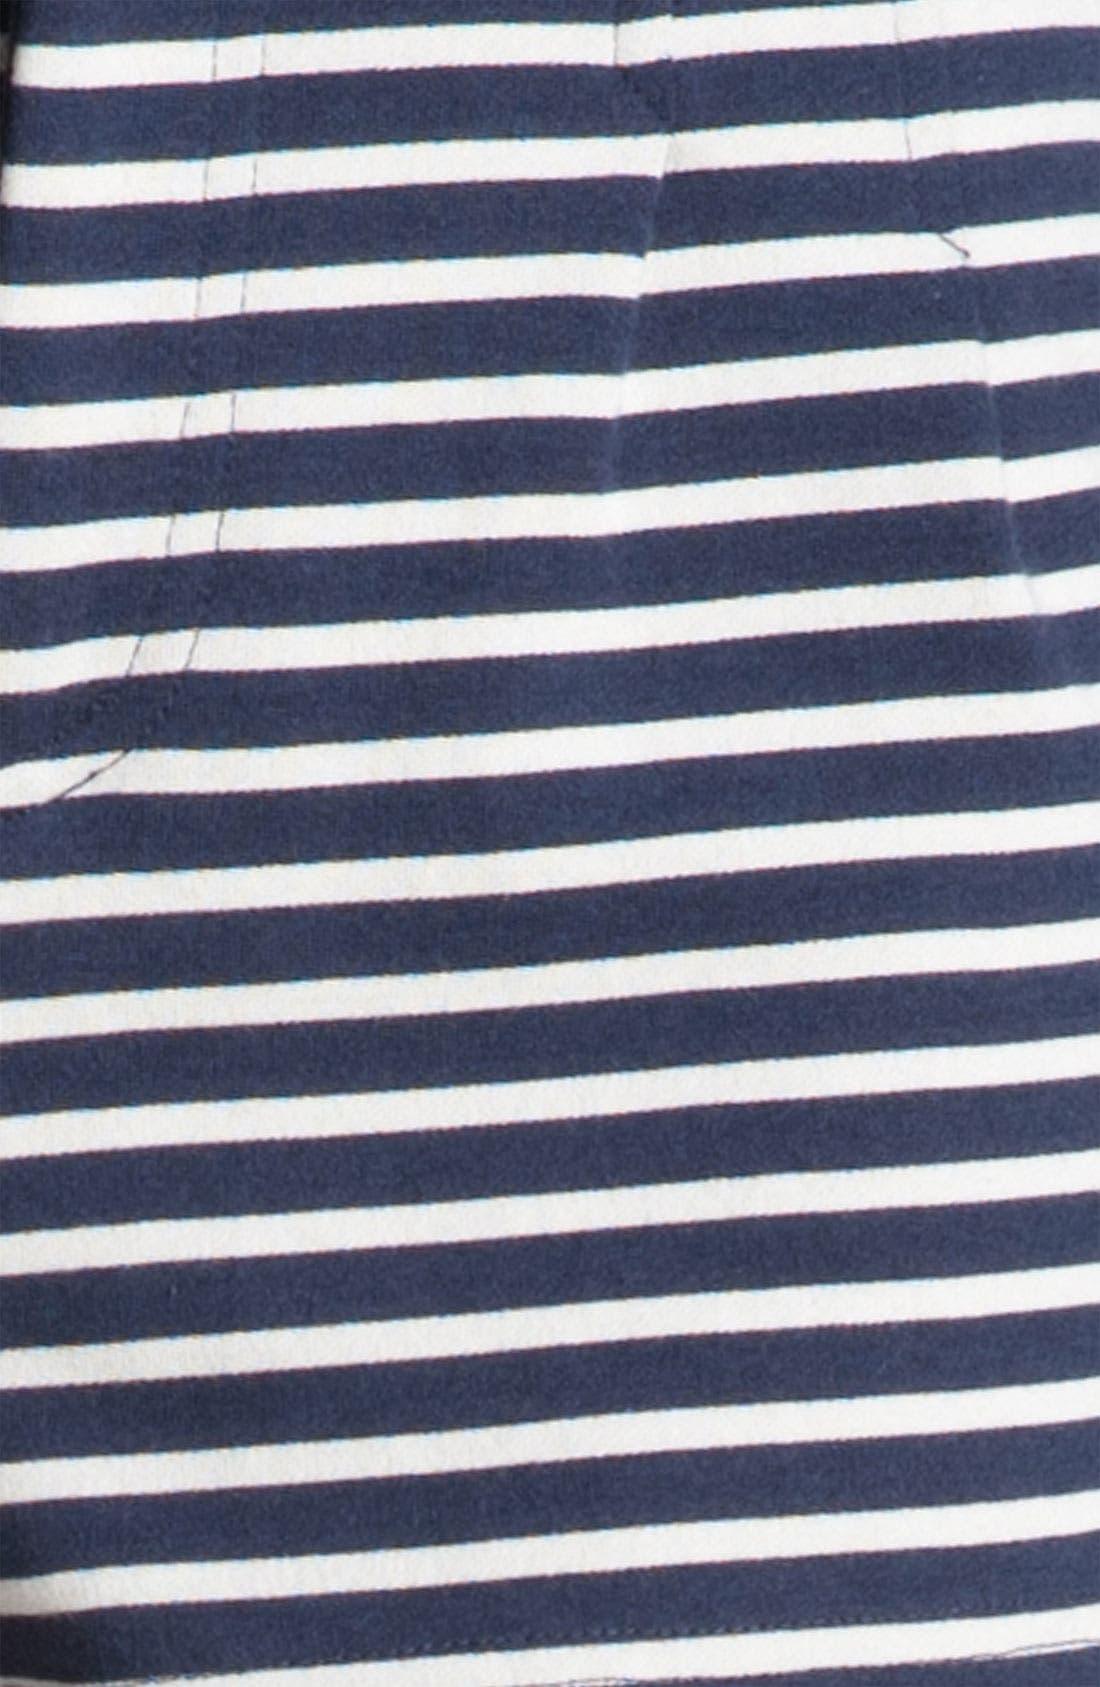 Alternate Image 3  - MARC BY MARC JACOBS 'Secret' Stripe Shorts